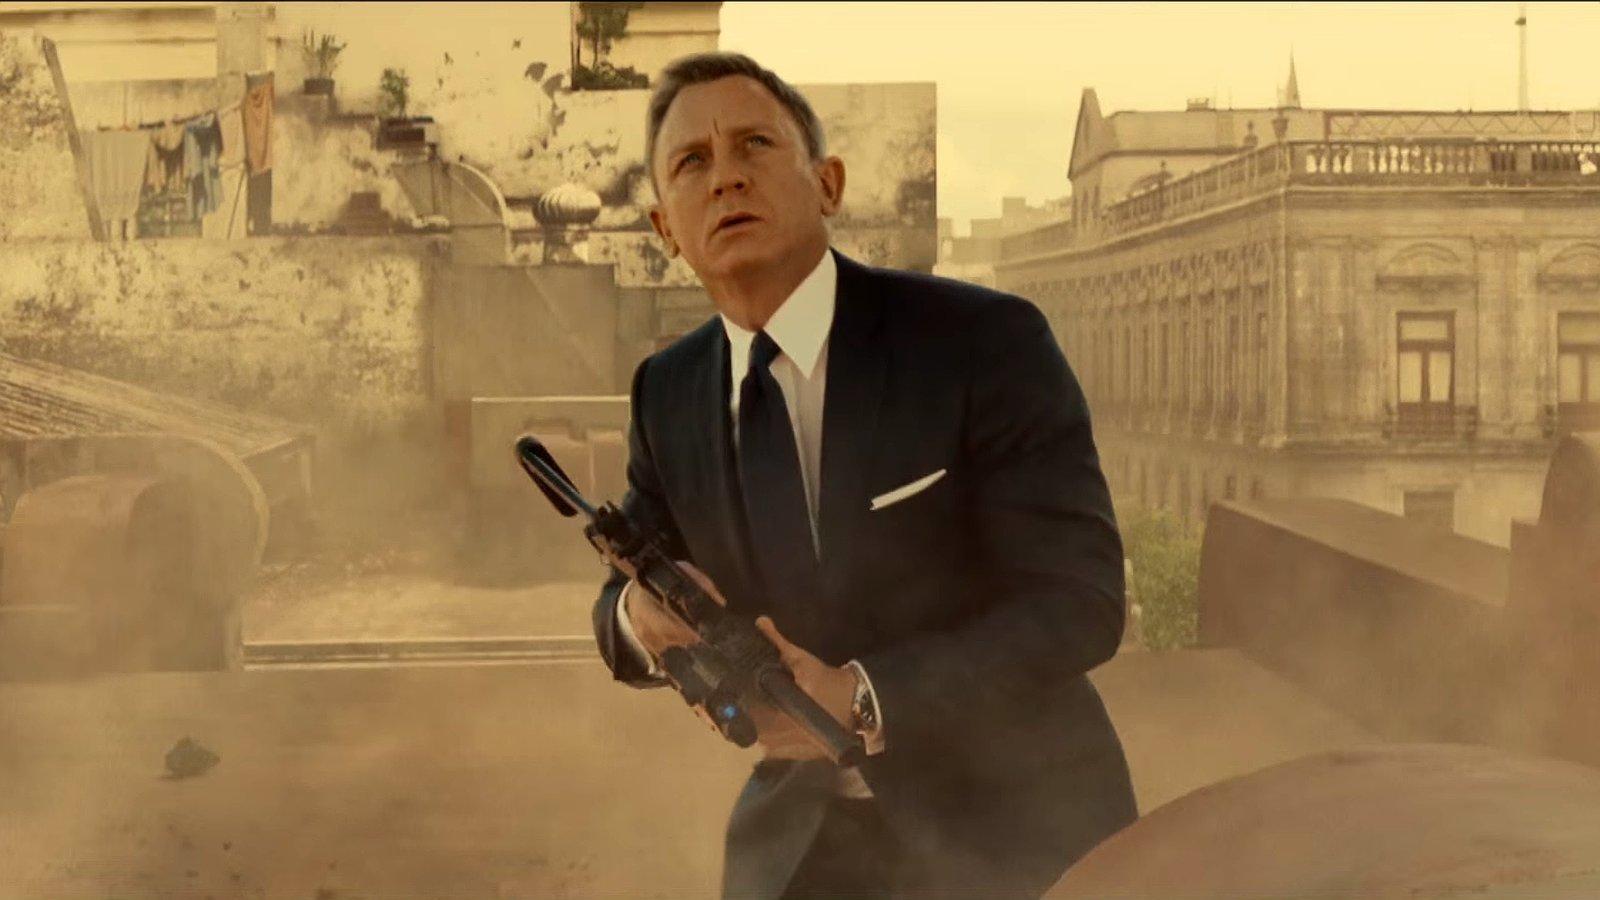 SPECTRE 007 BOND 24 james action 1spectre crime mystery spy thriller 1600x900